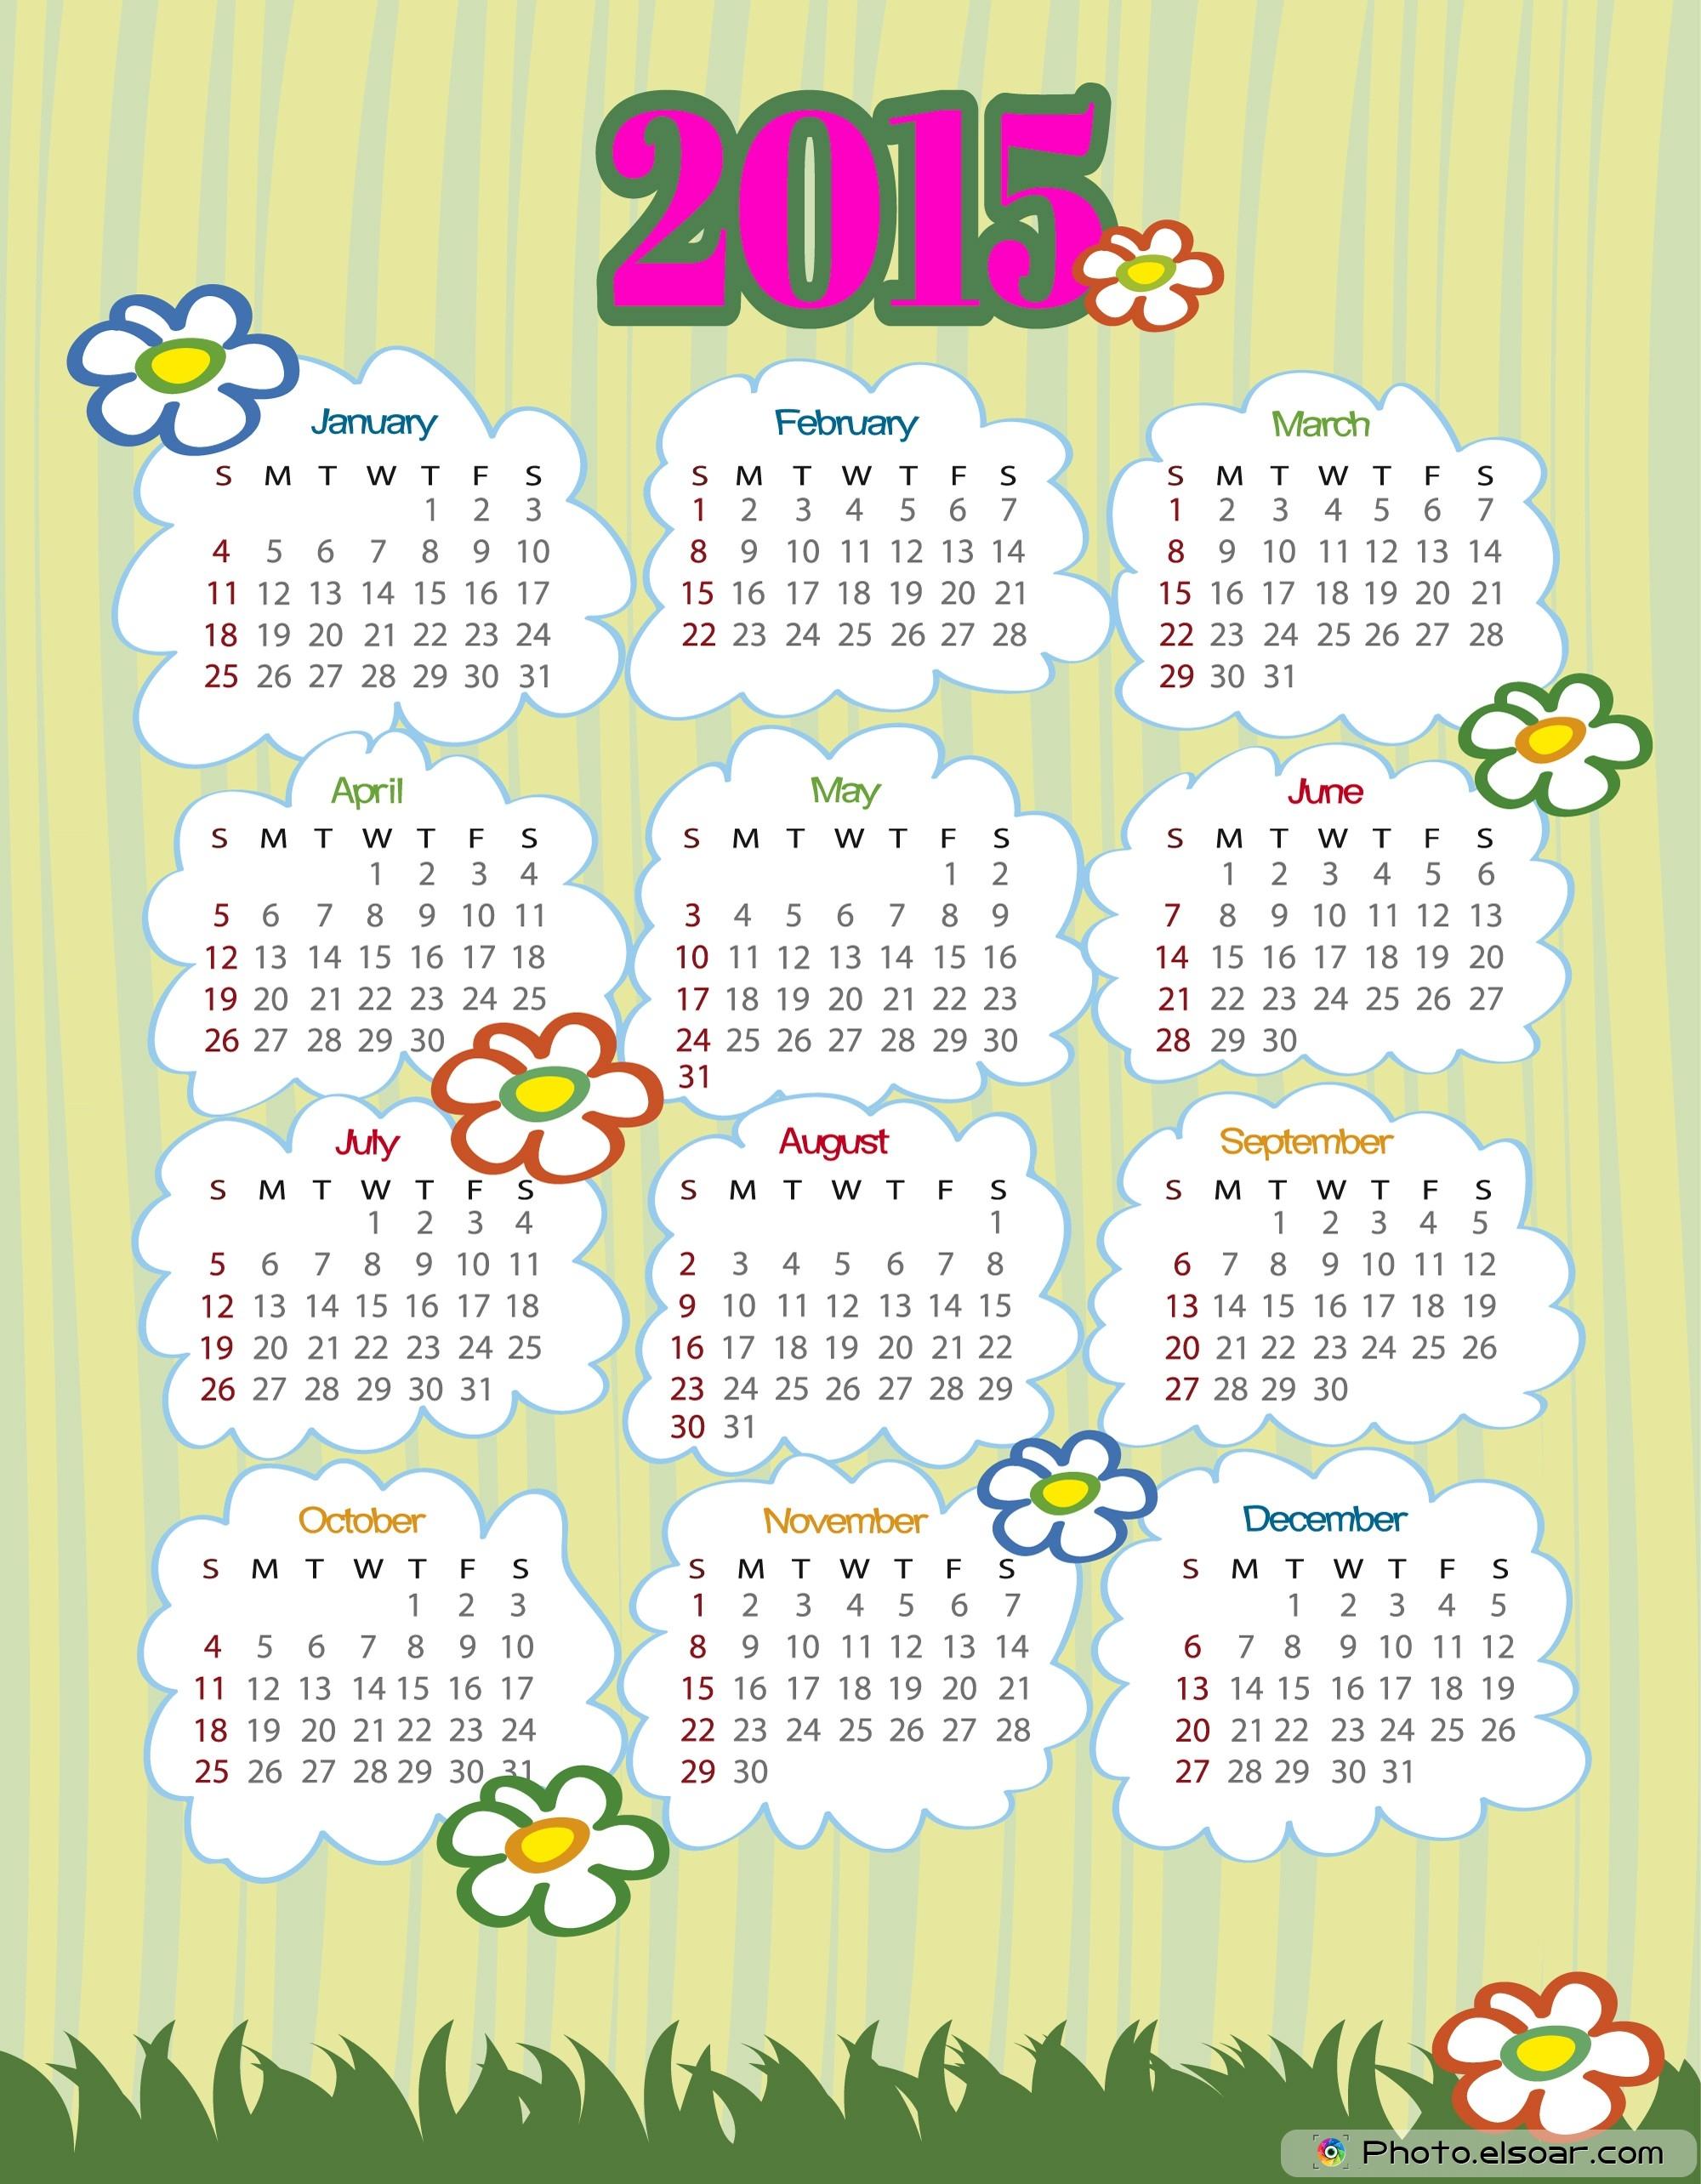 2015 Calendar Printable Flowers